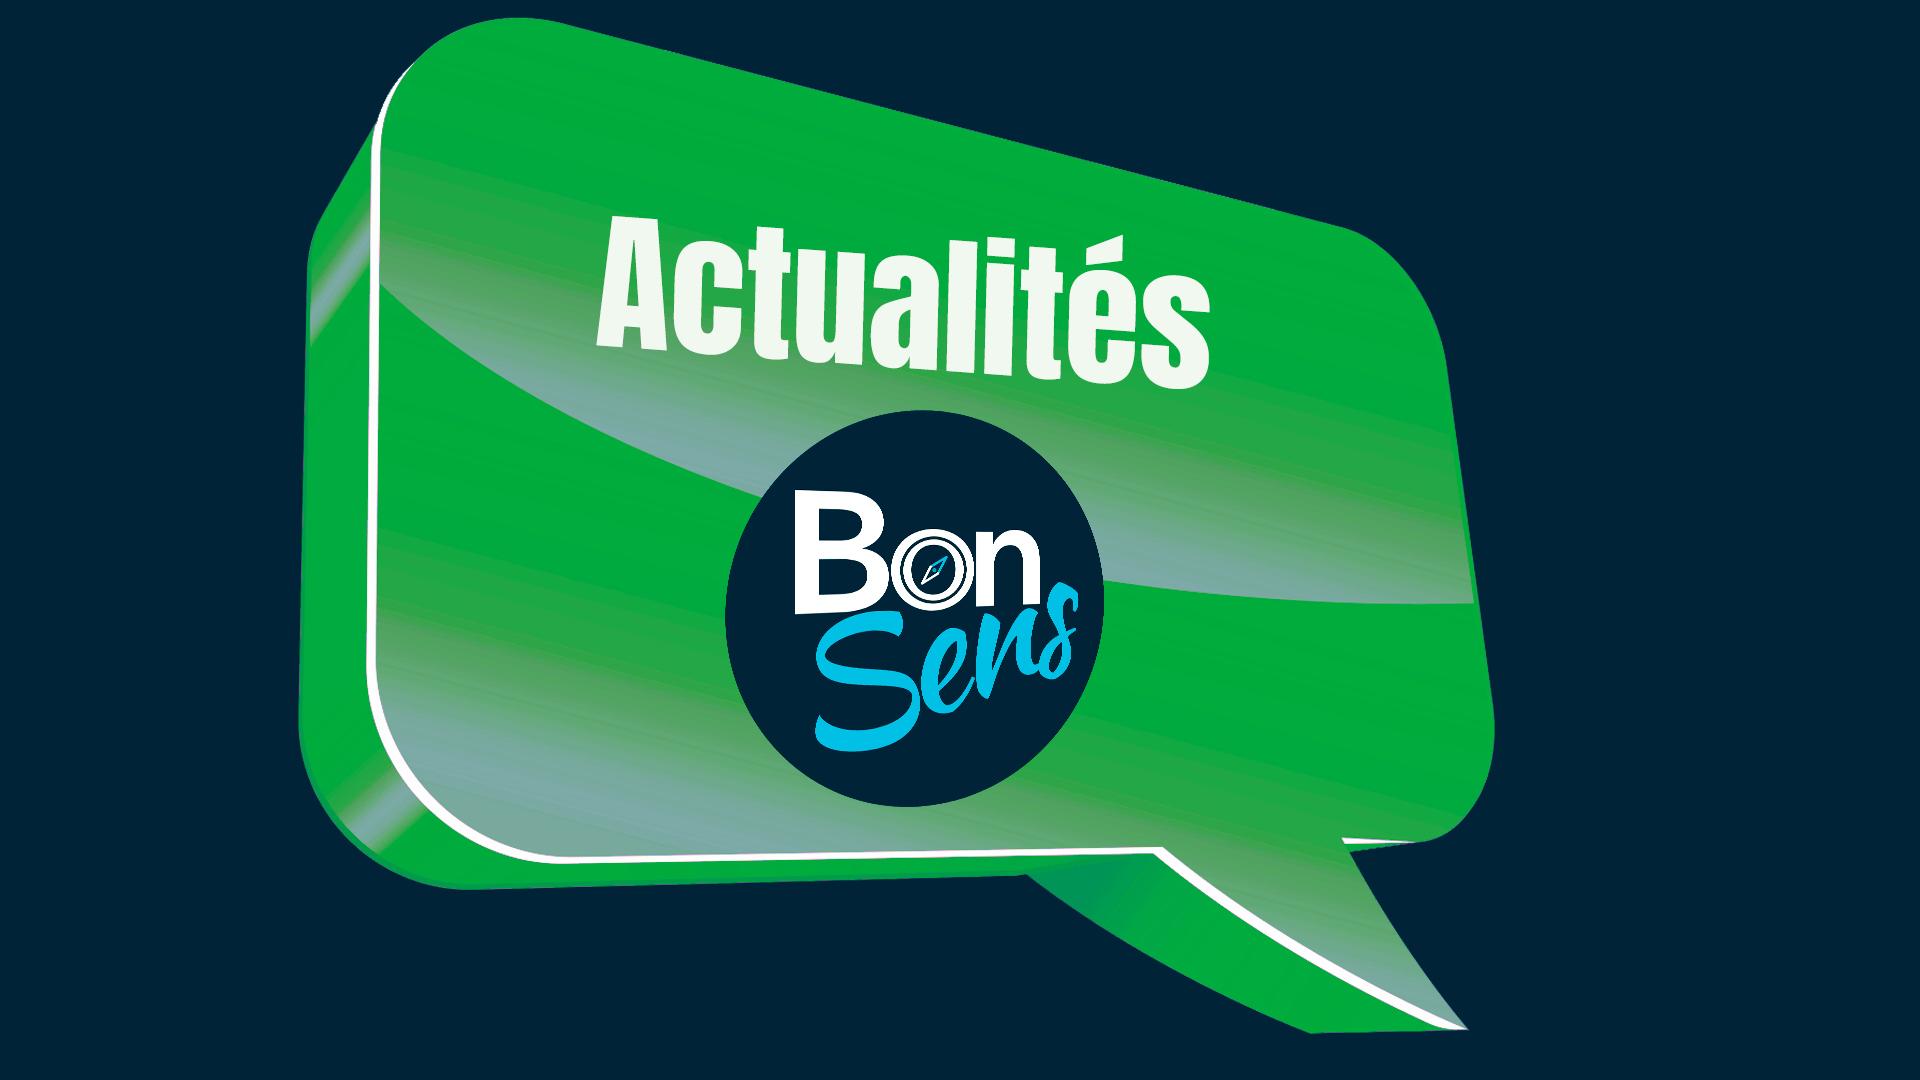 Actualités BonSens.org